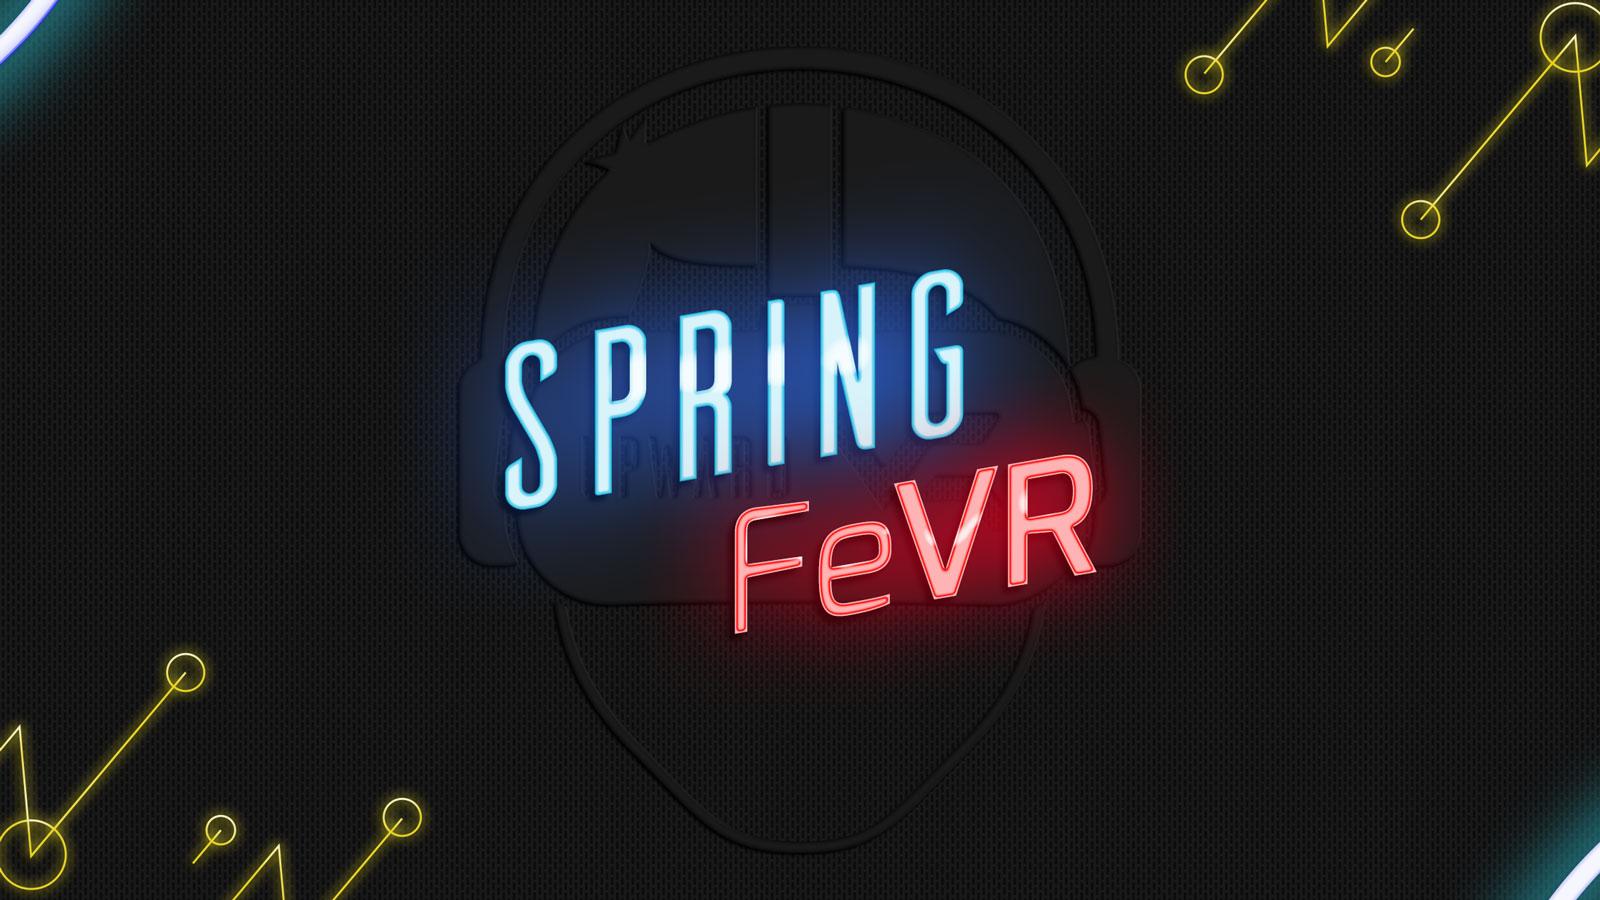 upward-vr-campaign-spring-fevr.jpg